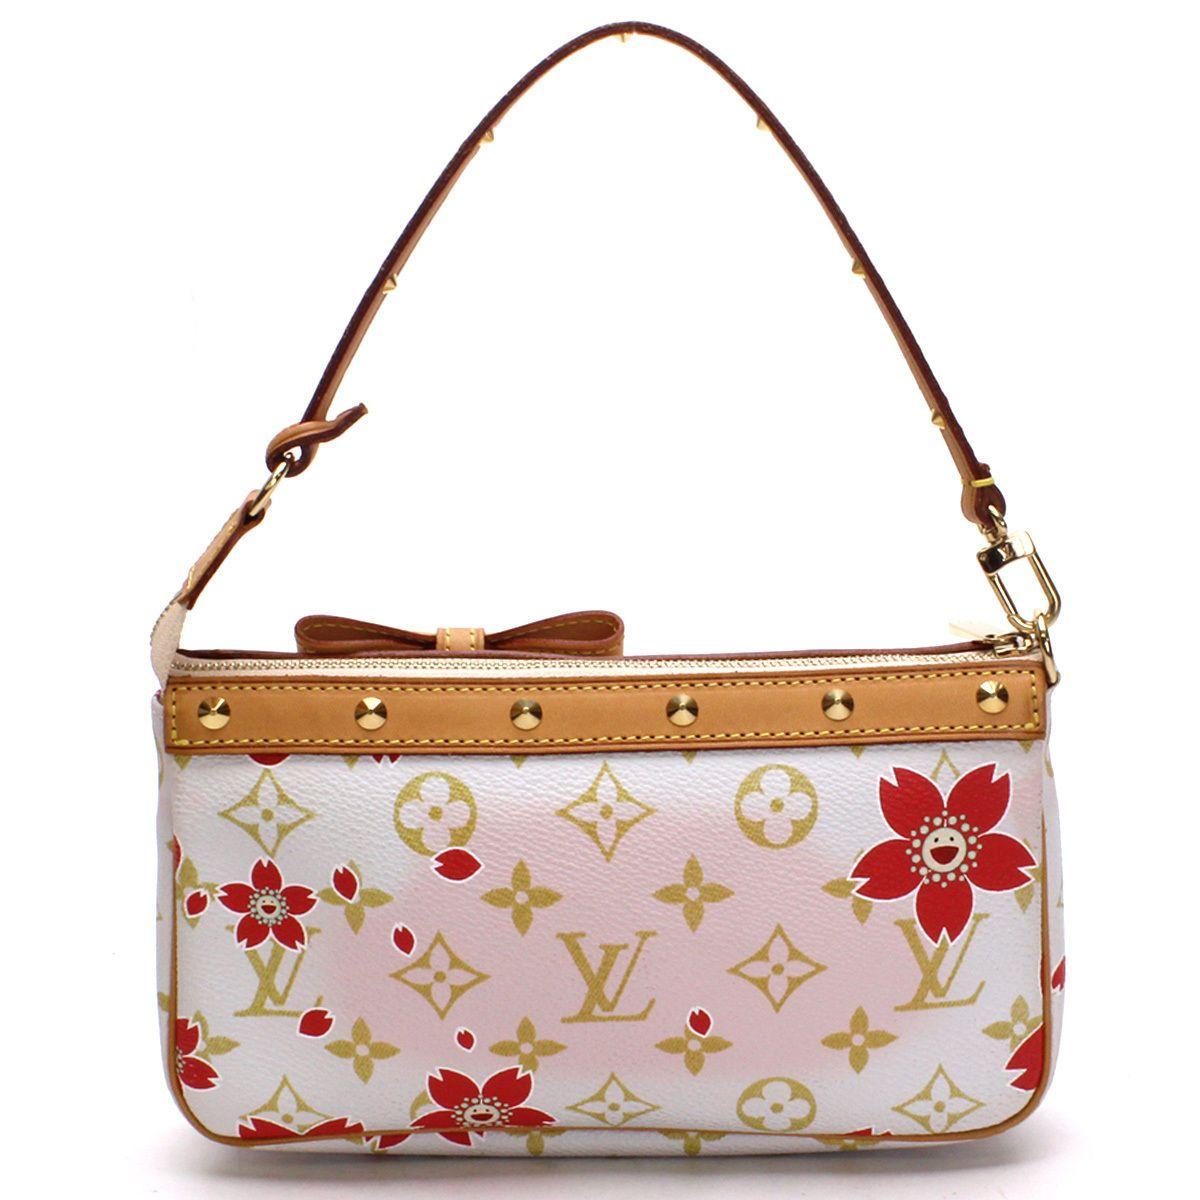 Louis vuitton e red cherry blossom monogram pochette bag murakami free same  day ship jpg 1200x1200 7eacb769331e2